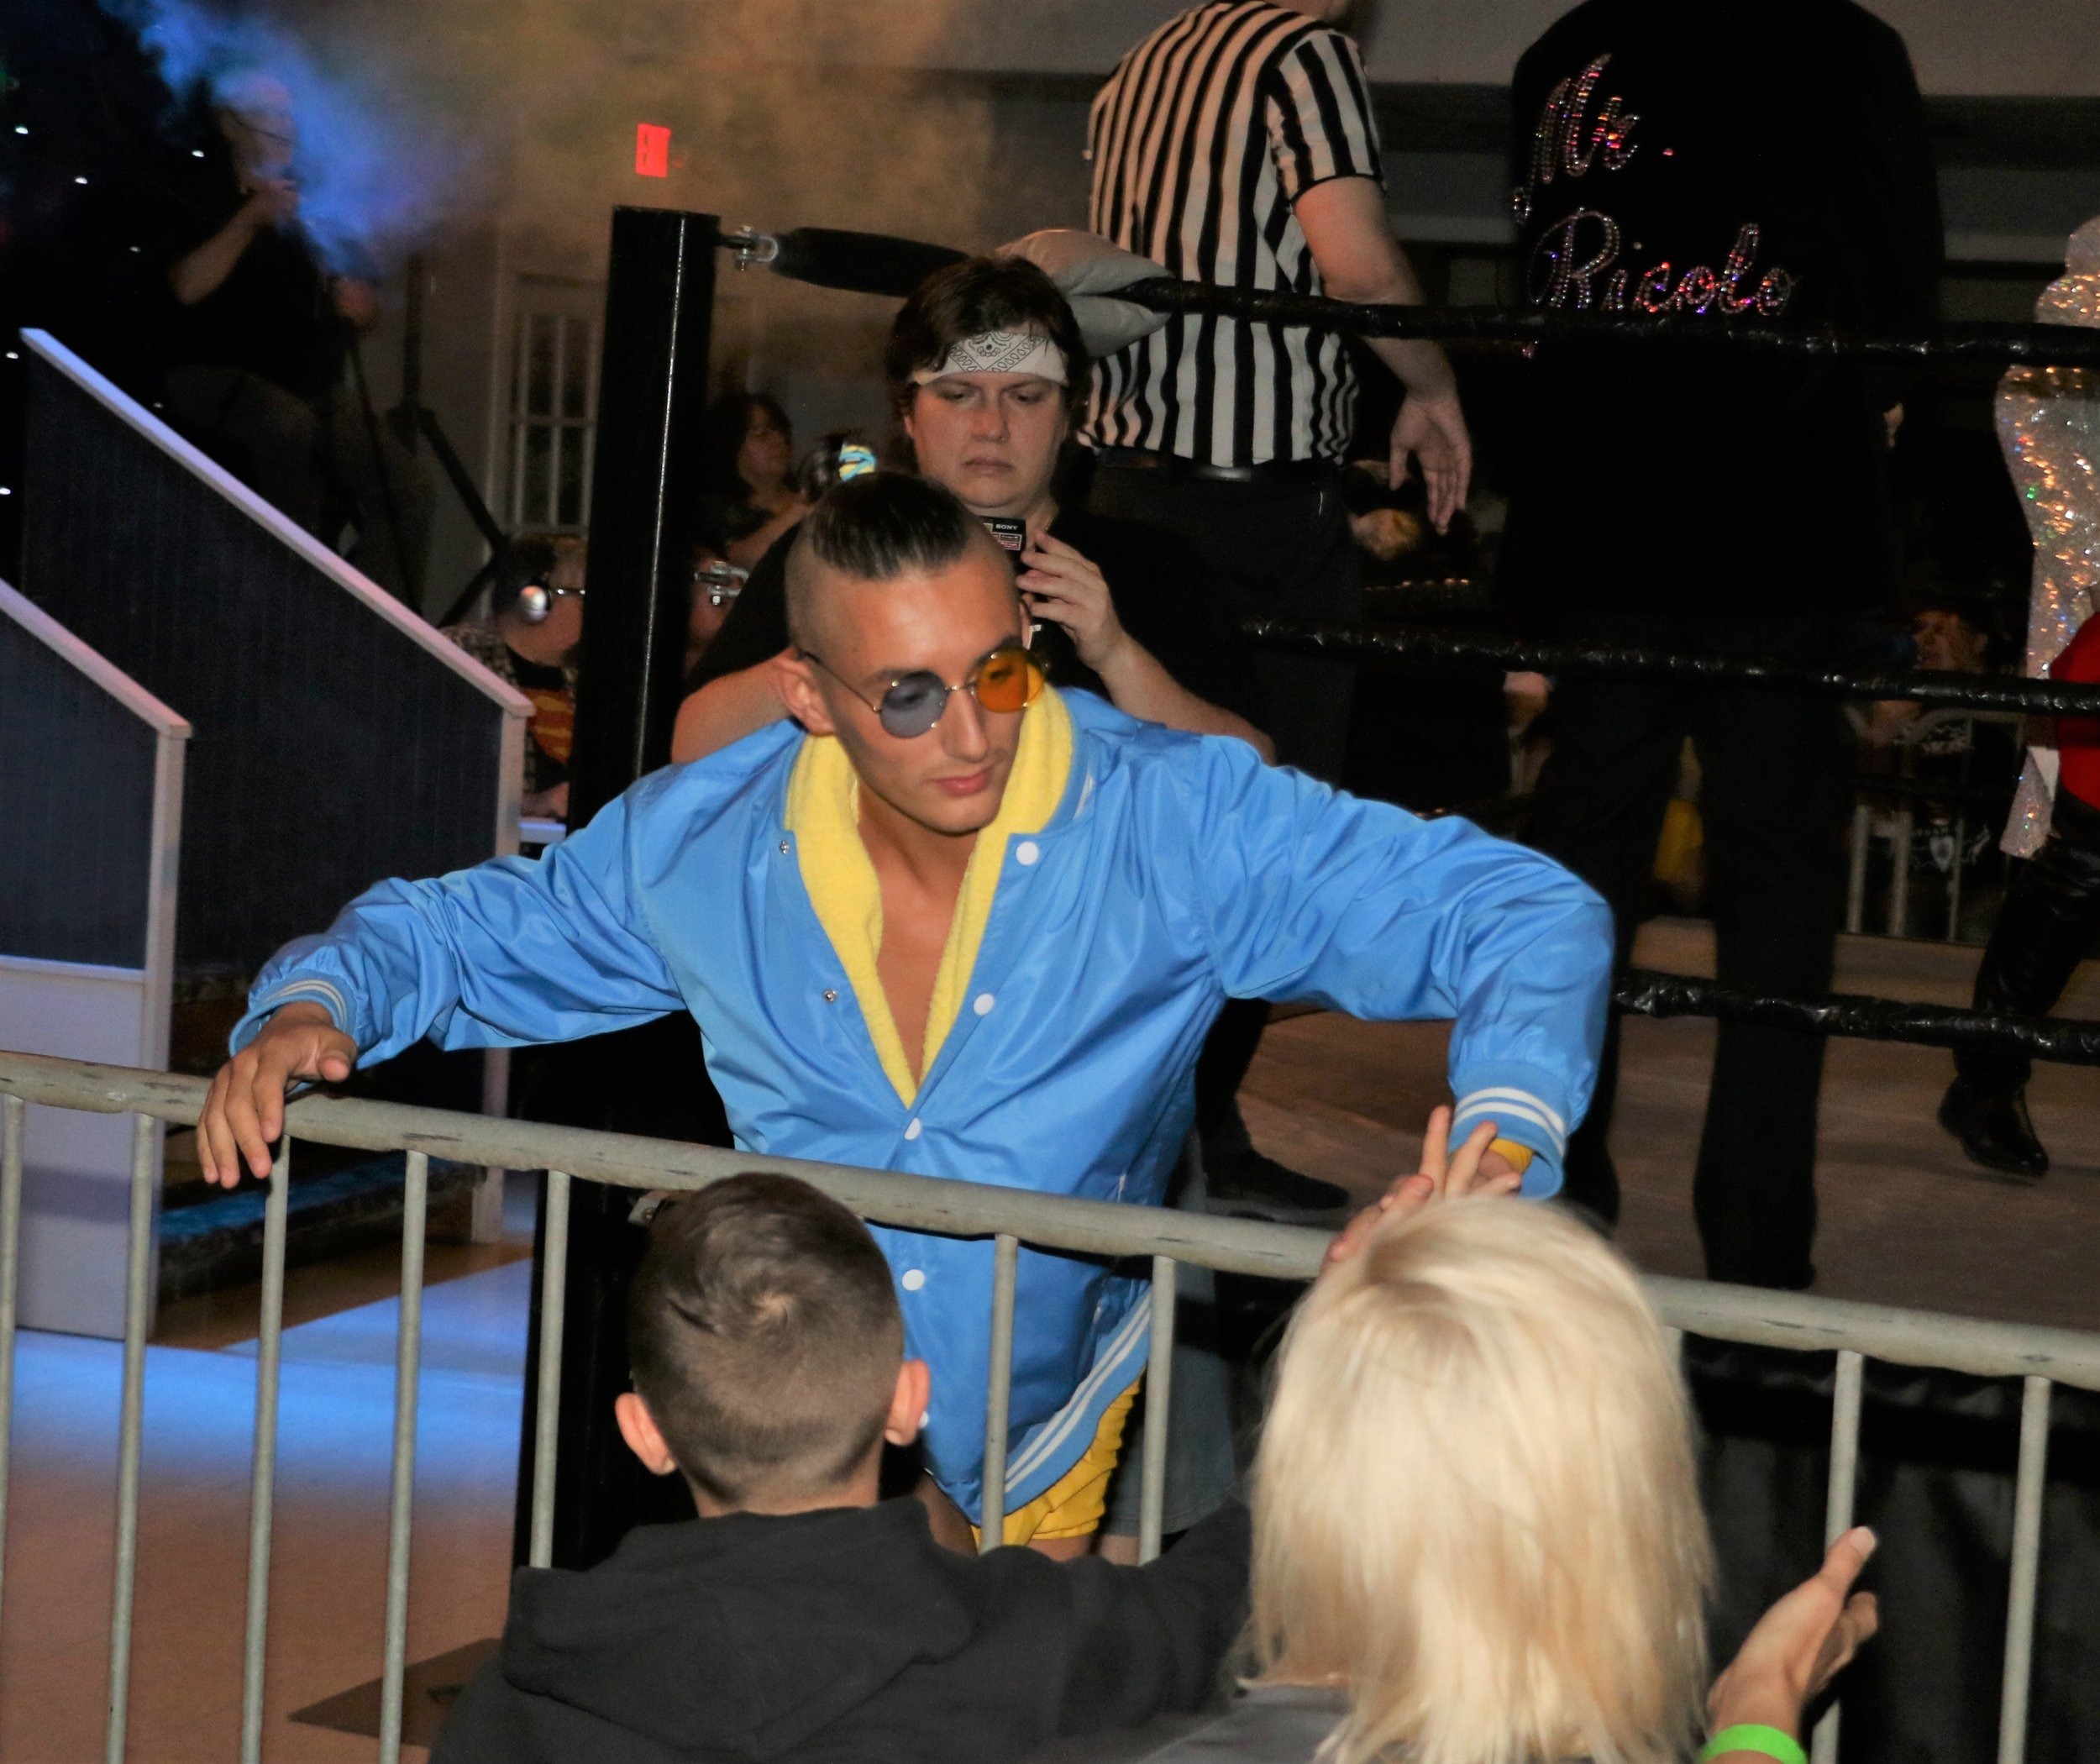 Jordan Kross greets fans around the ring.